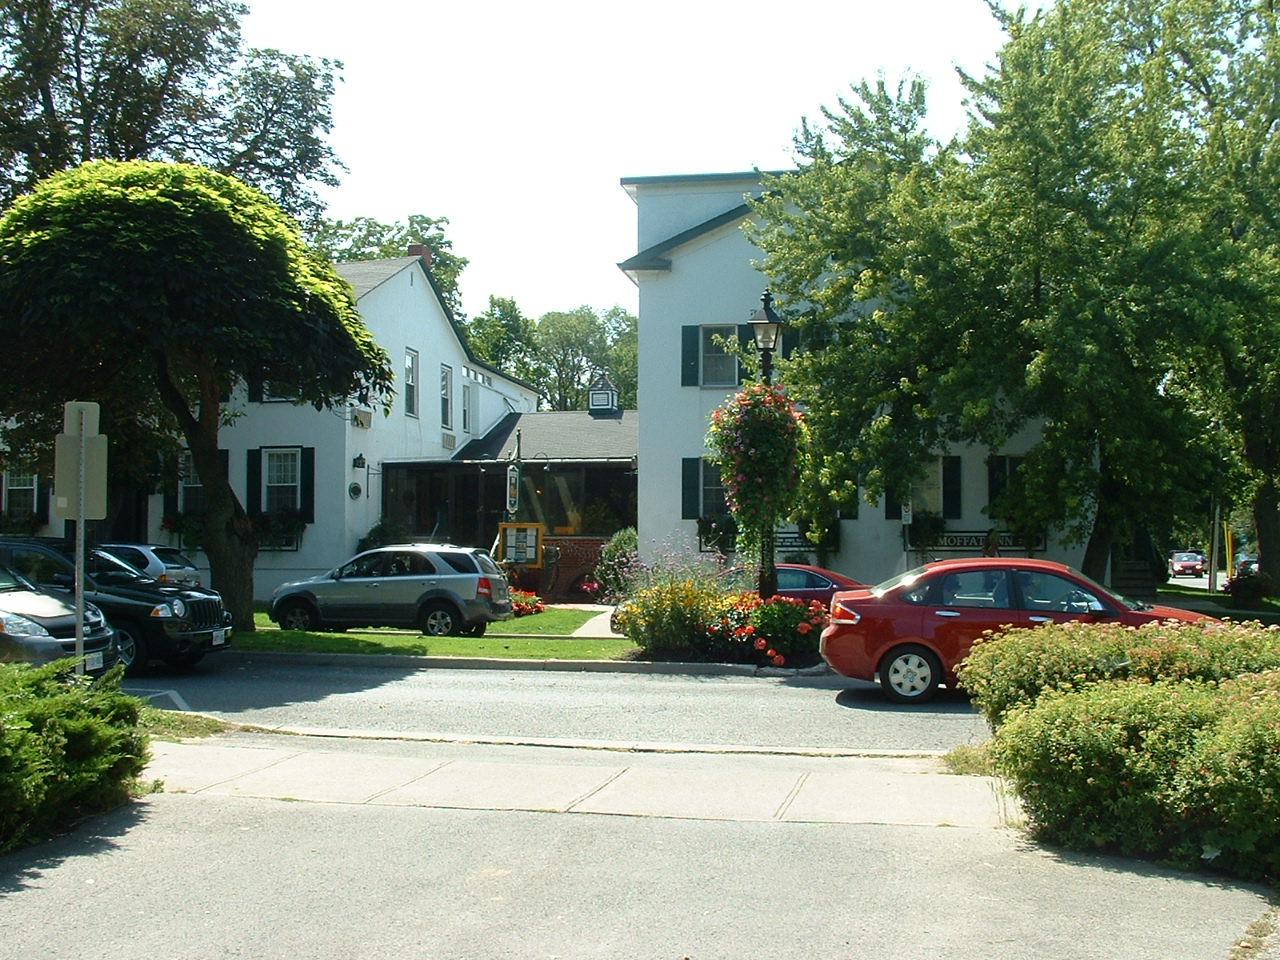 Moffat Inn, Niagara-on-the-Lake